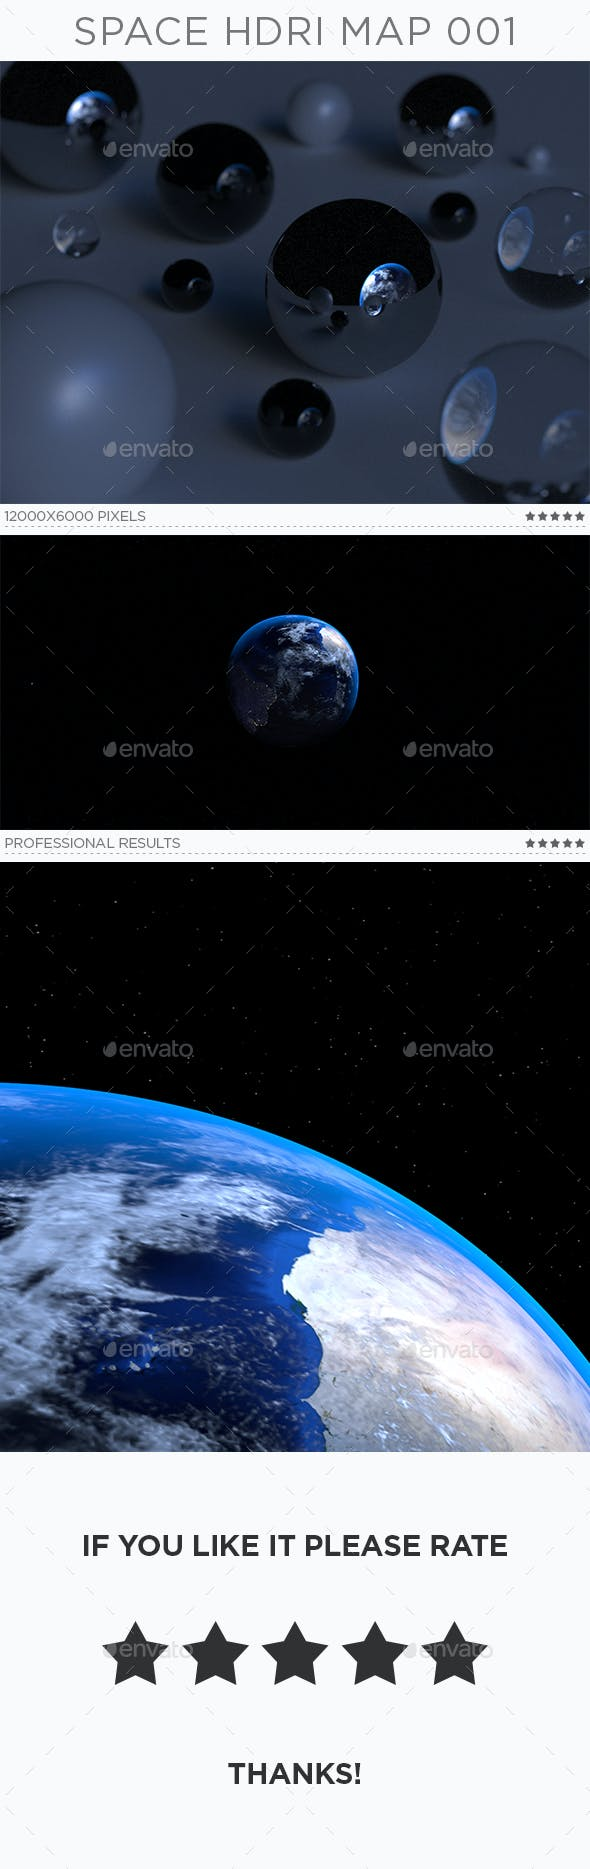 Space HDRi Map 001 - 3DOcean Item for Sale